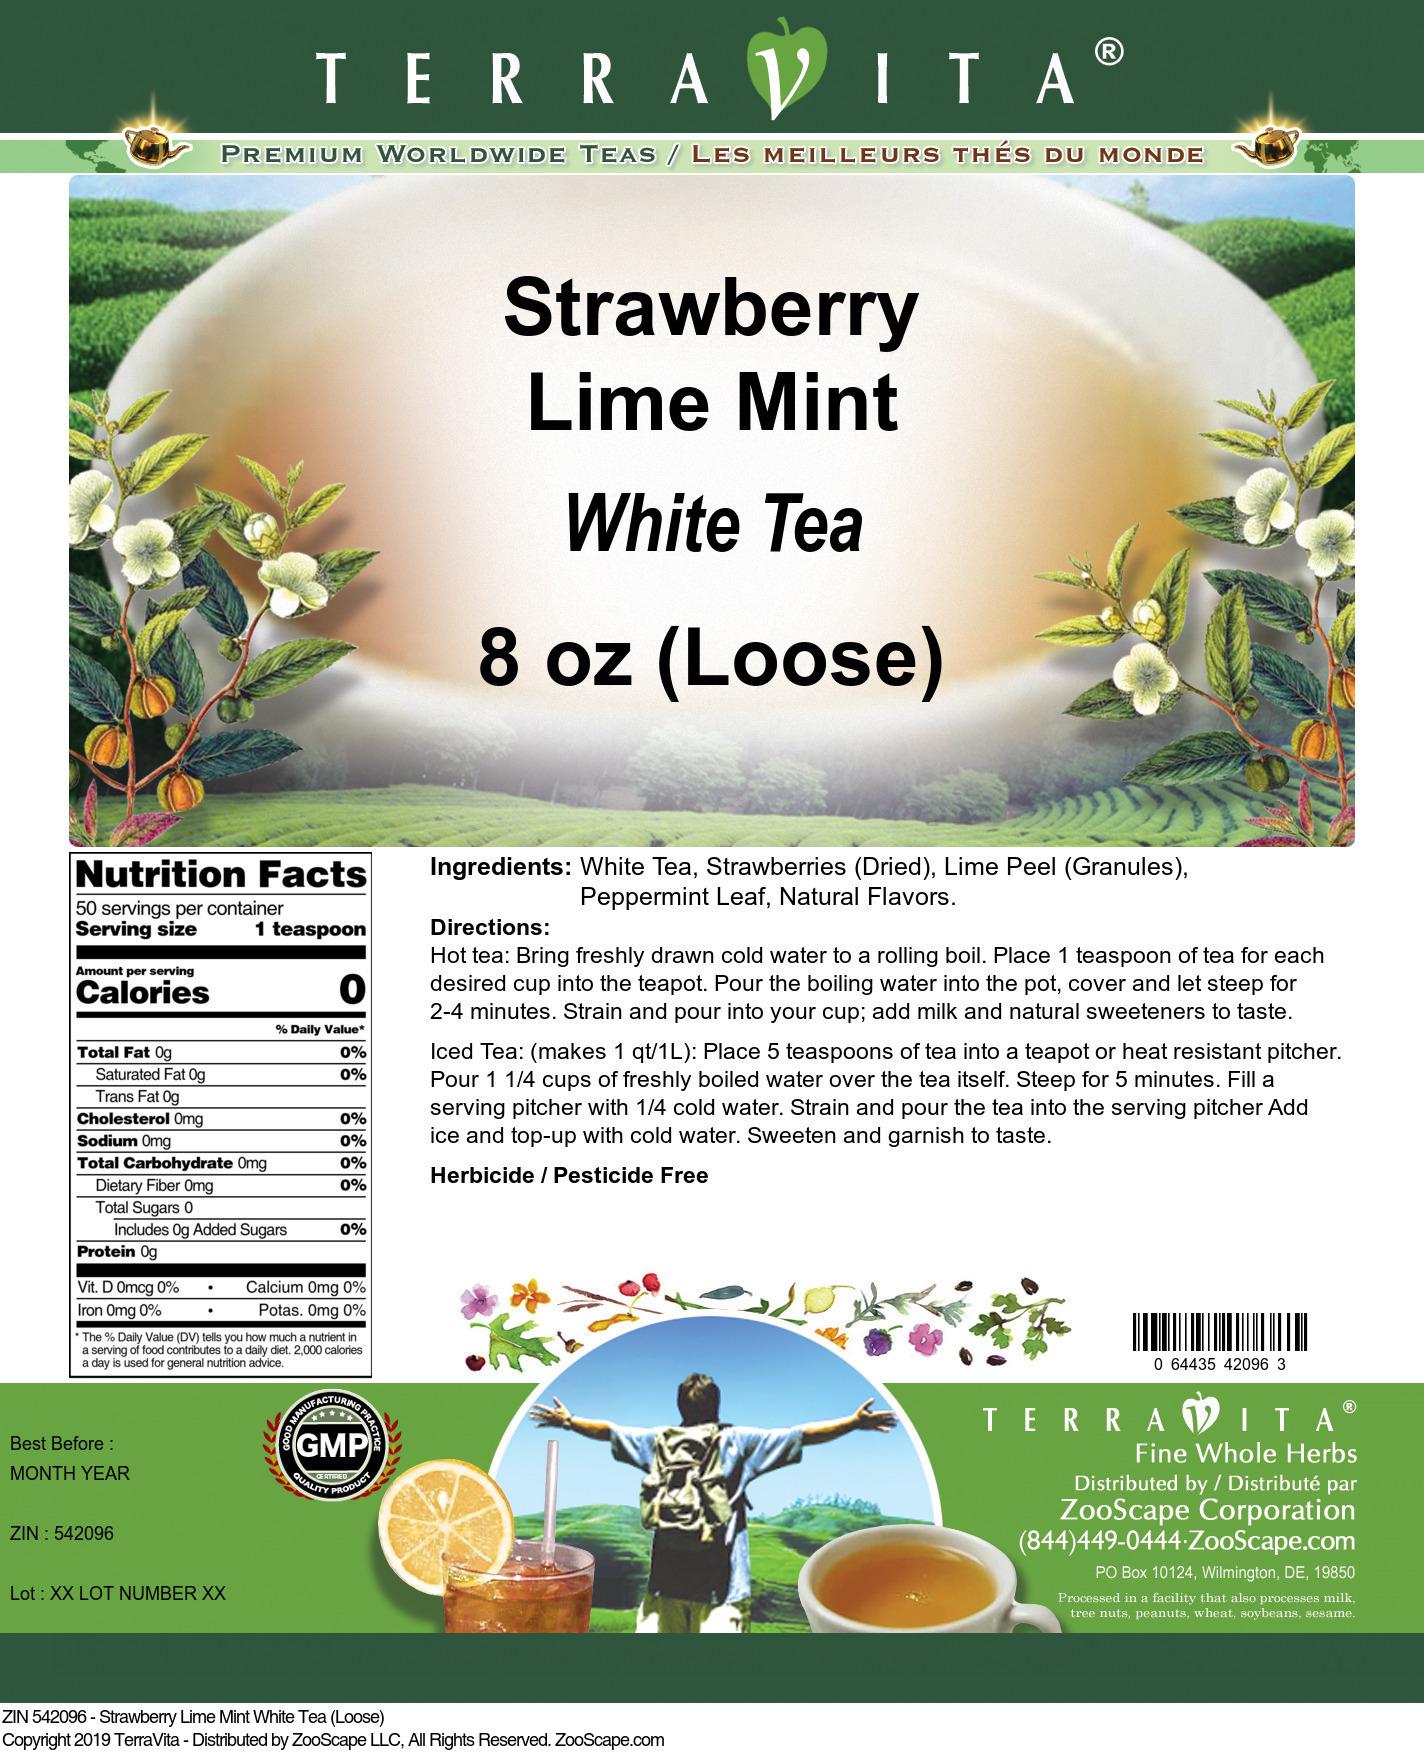 Strawberry Lime Mint White Tea (Loose)